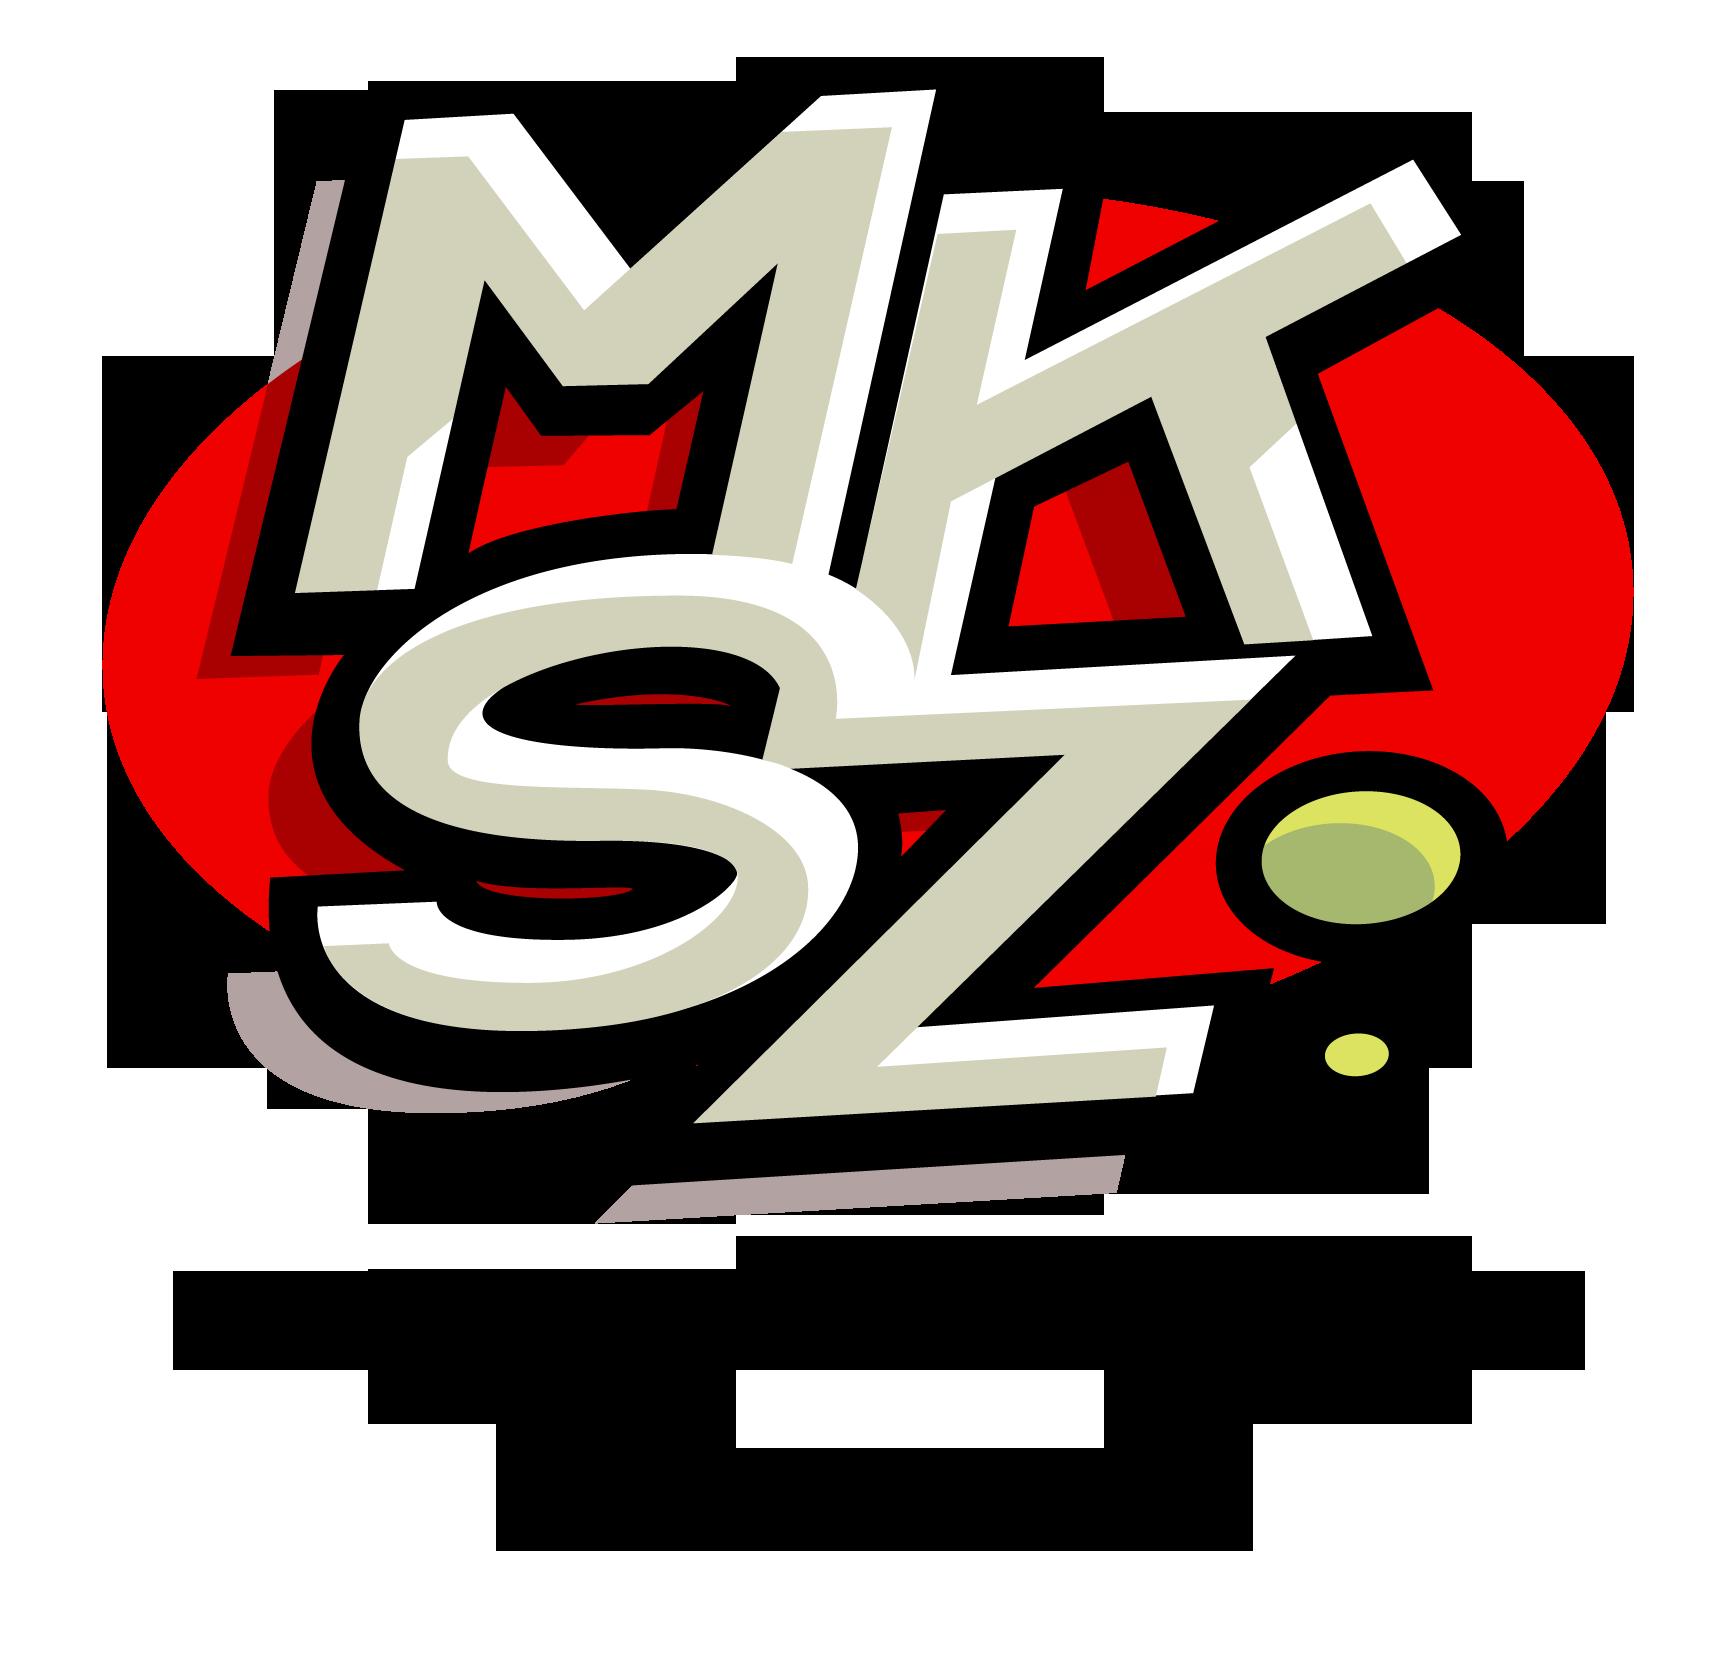 MKSZ logo2.png